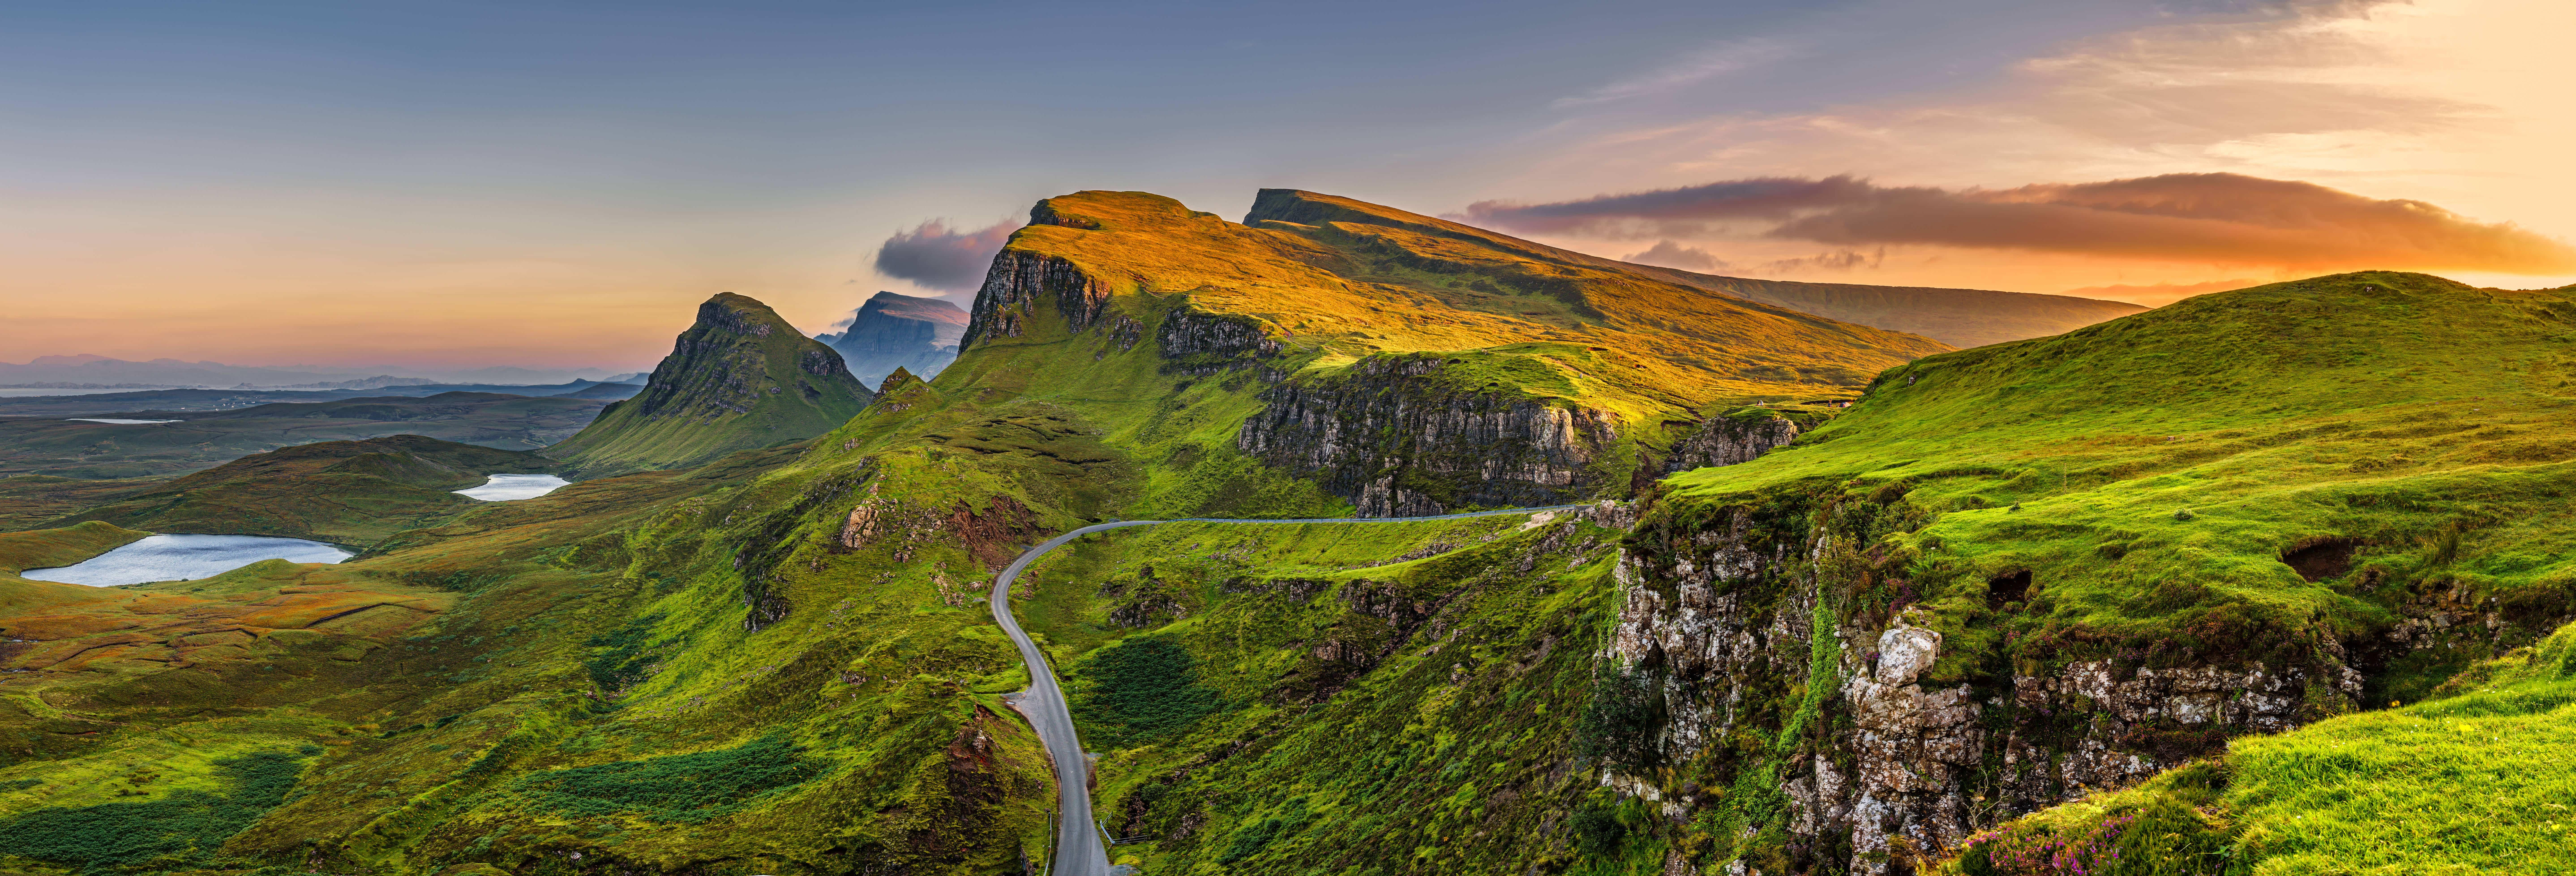 scotland_panorama